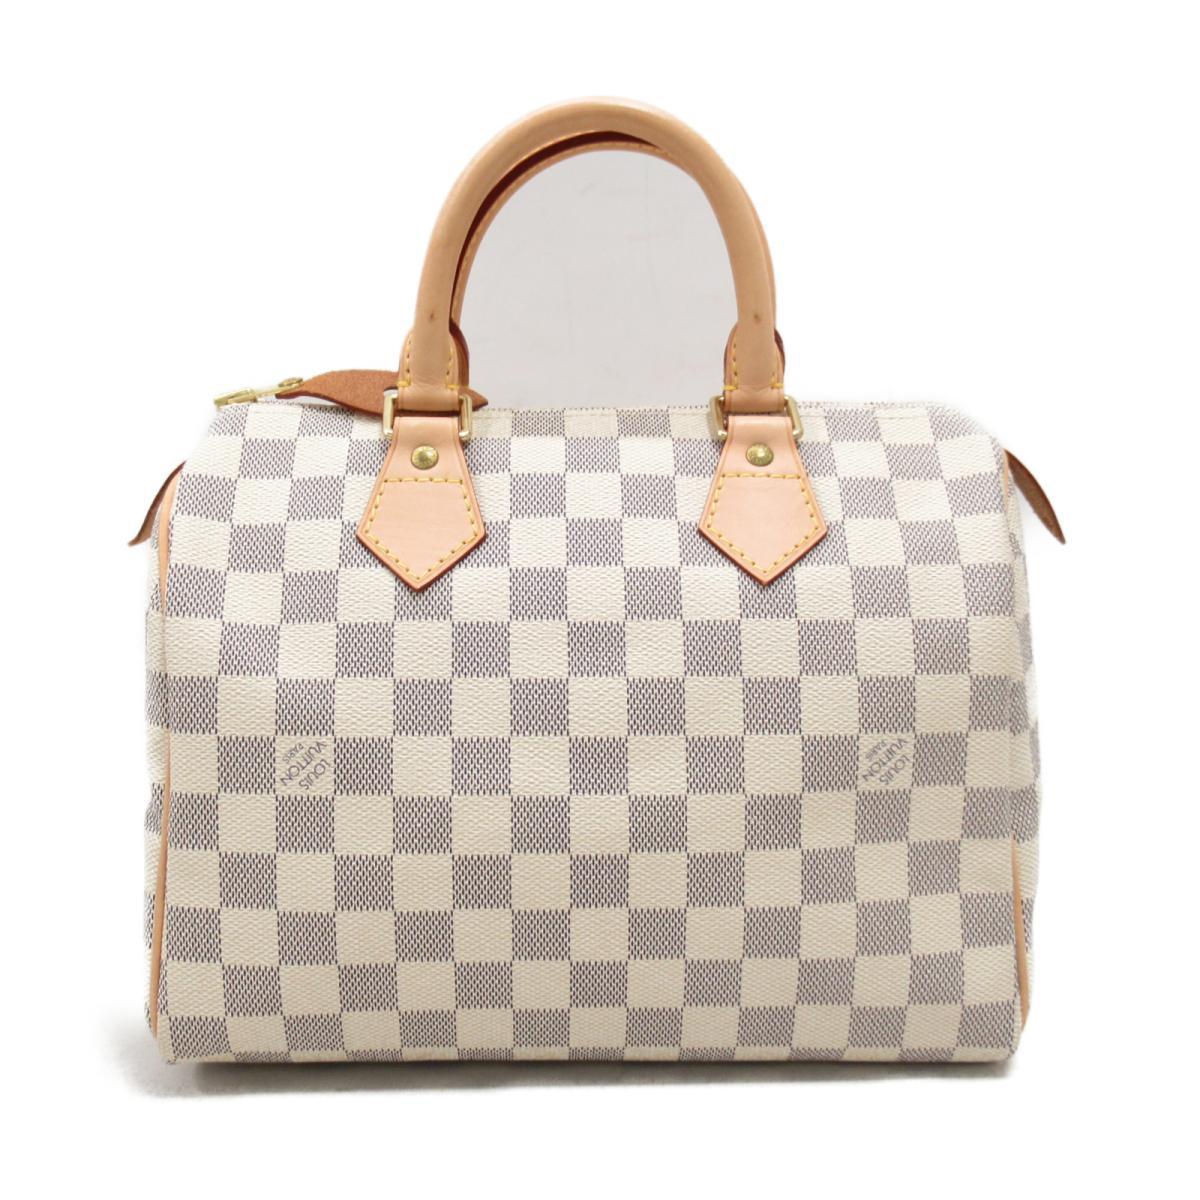 def30e1f618a (Free shipping) Auth LOUIS VUITTON Speedy 25 Hand bag N41534 Damier Azur  Damier Azur Used